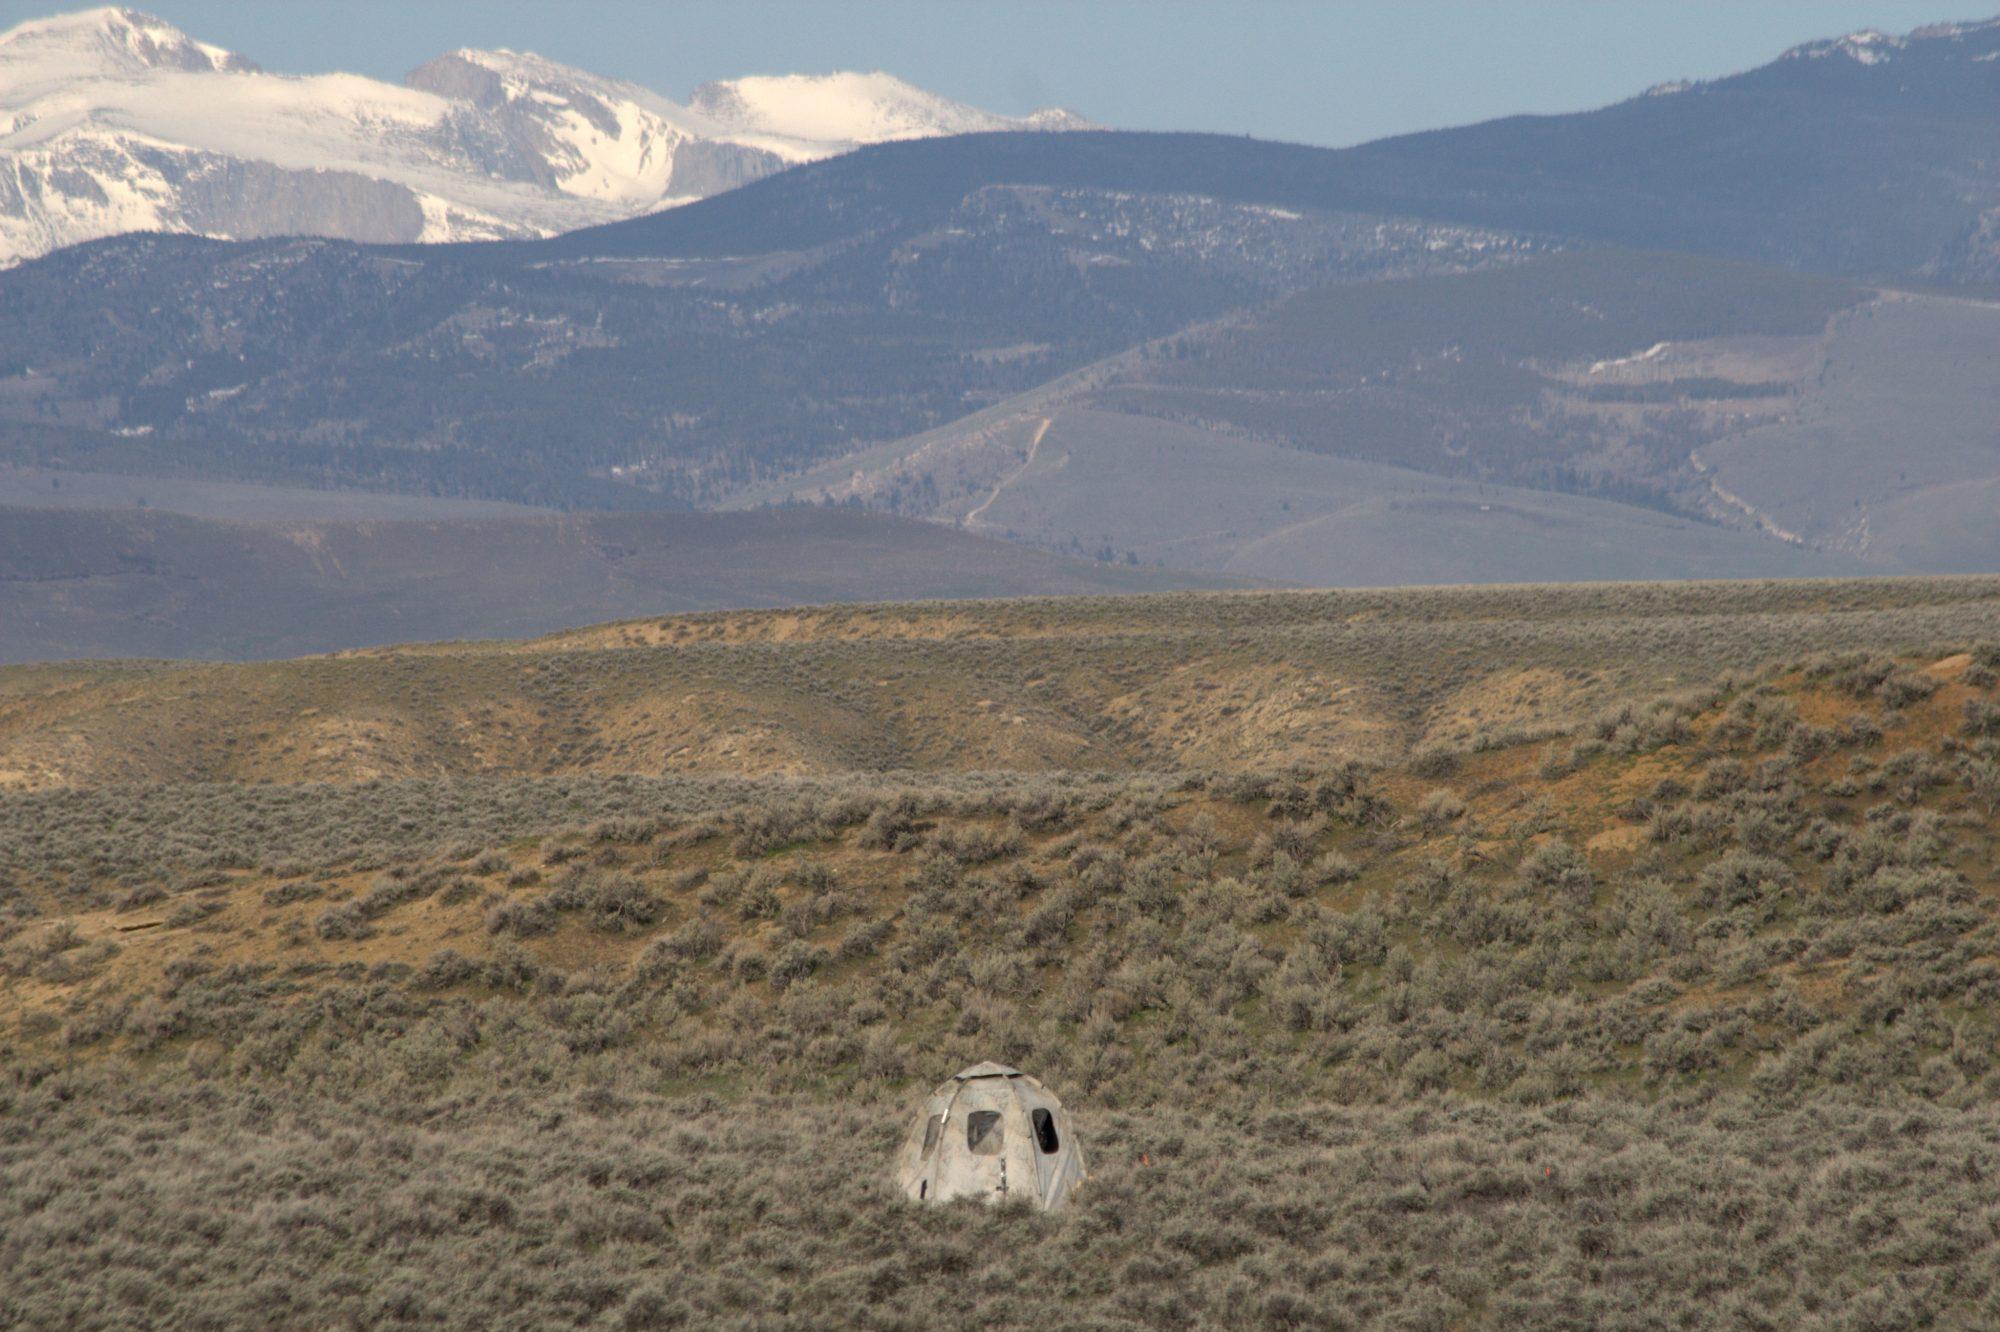 Observation blind overlooking Cottontail Lek